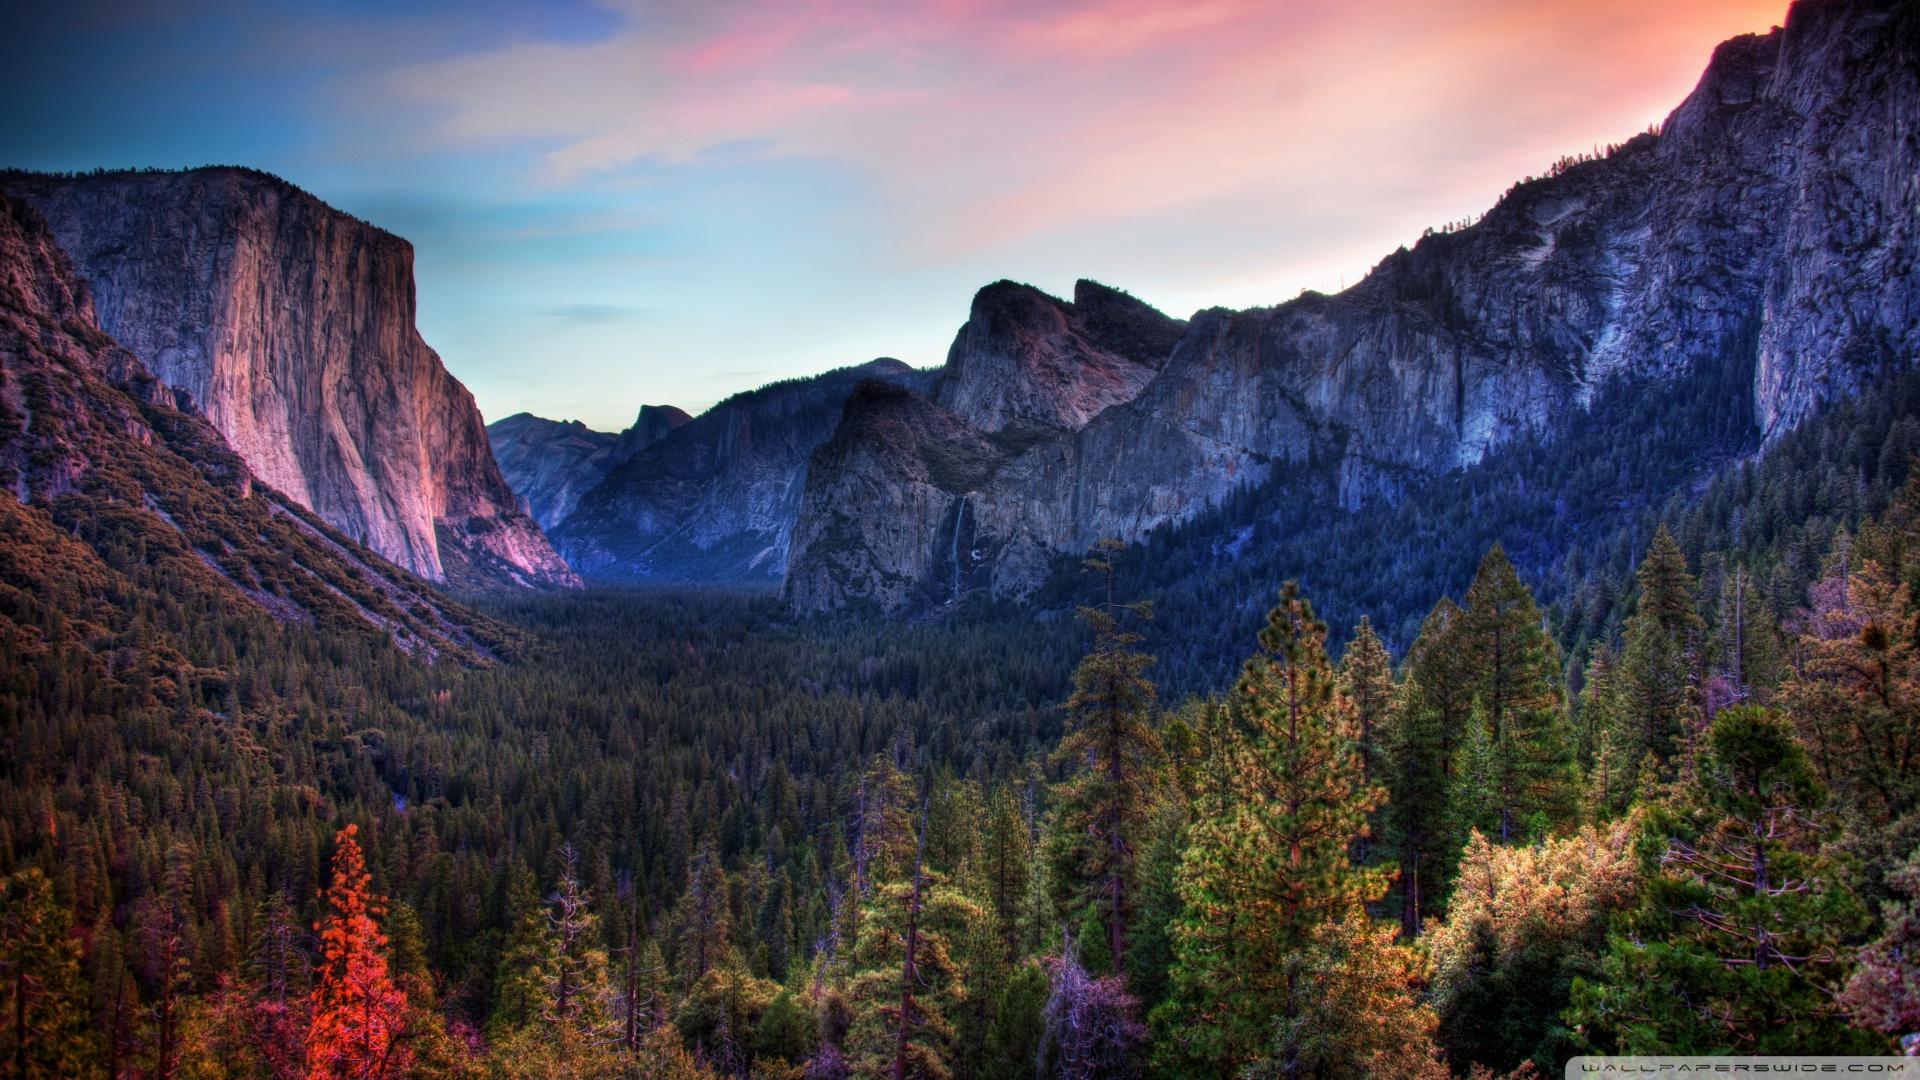 HD Yosemite Wallpaper